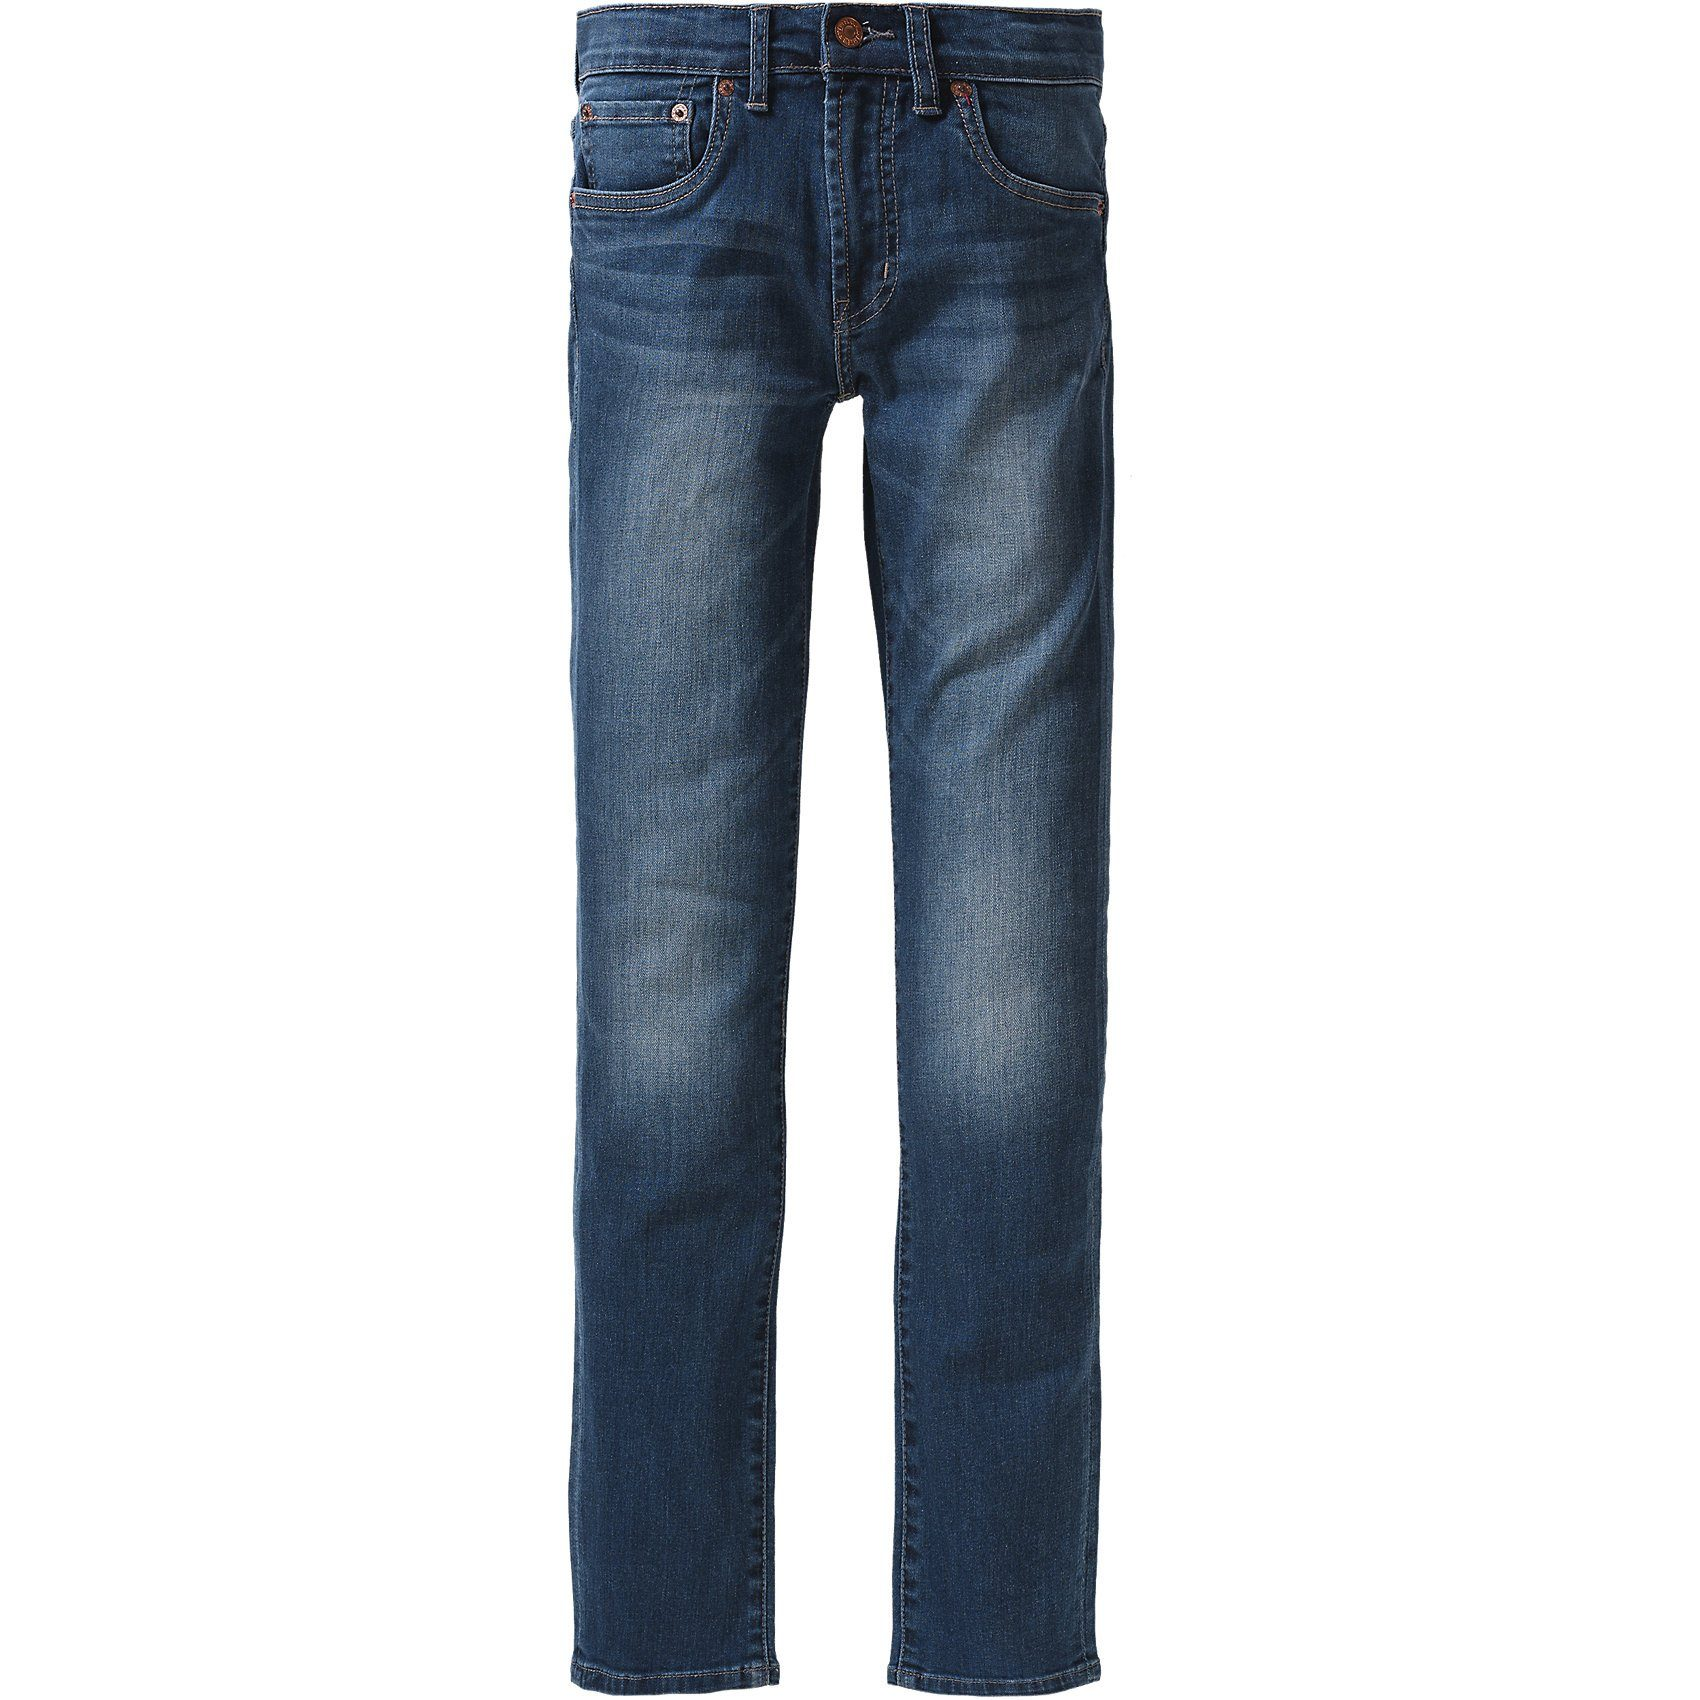 Levi's® Jeans 510 Skinny fit für Jungen